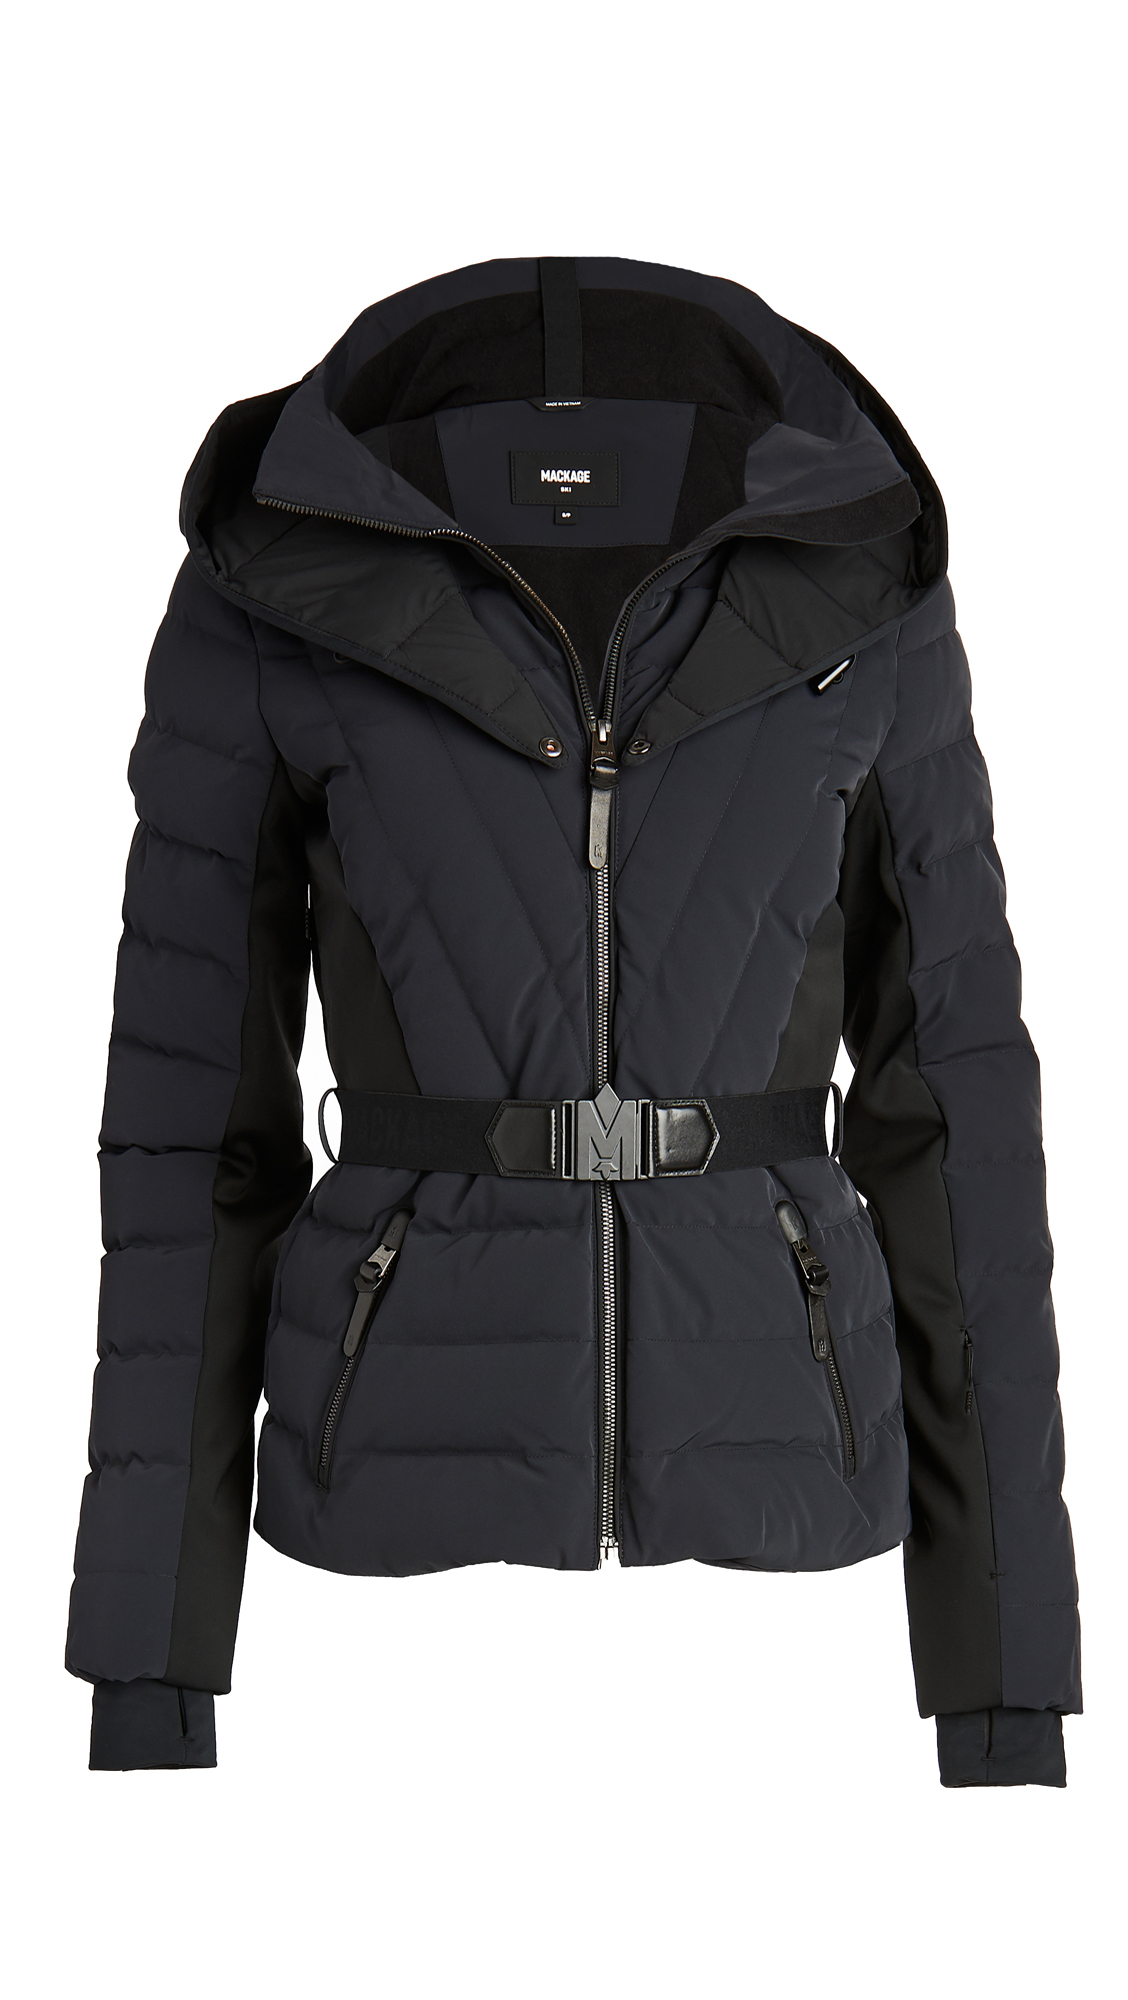 Mackage Elita Ski Jacket